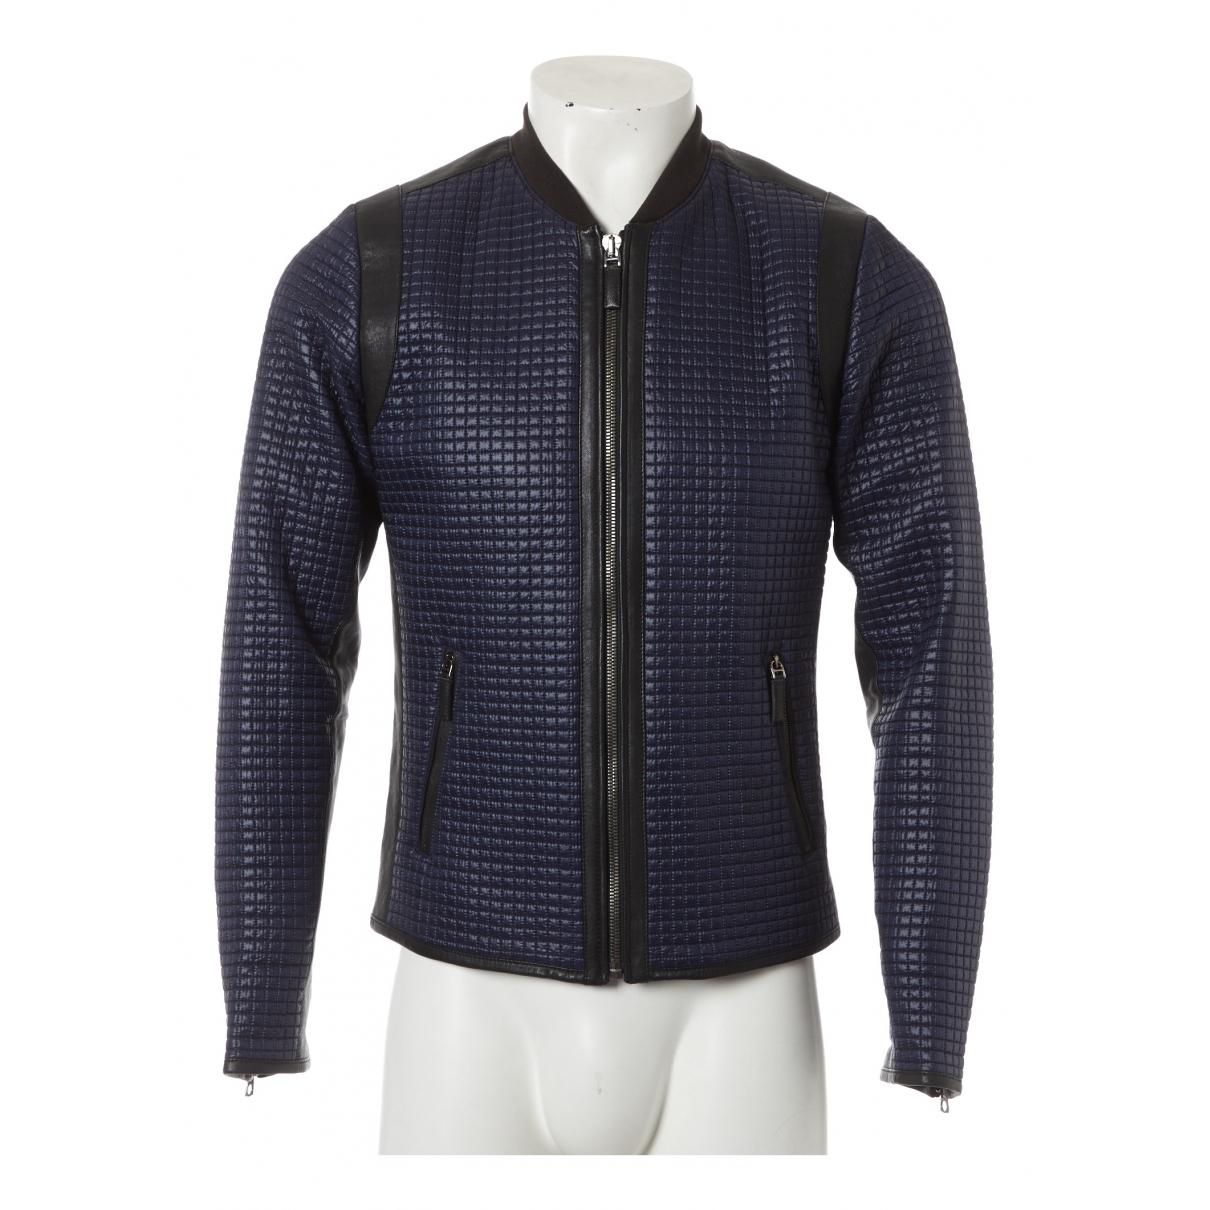 Dolce & Gabbana \N Navy jacket  for Men 50 IT